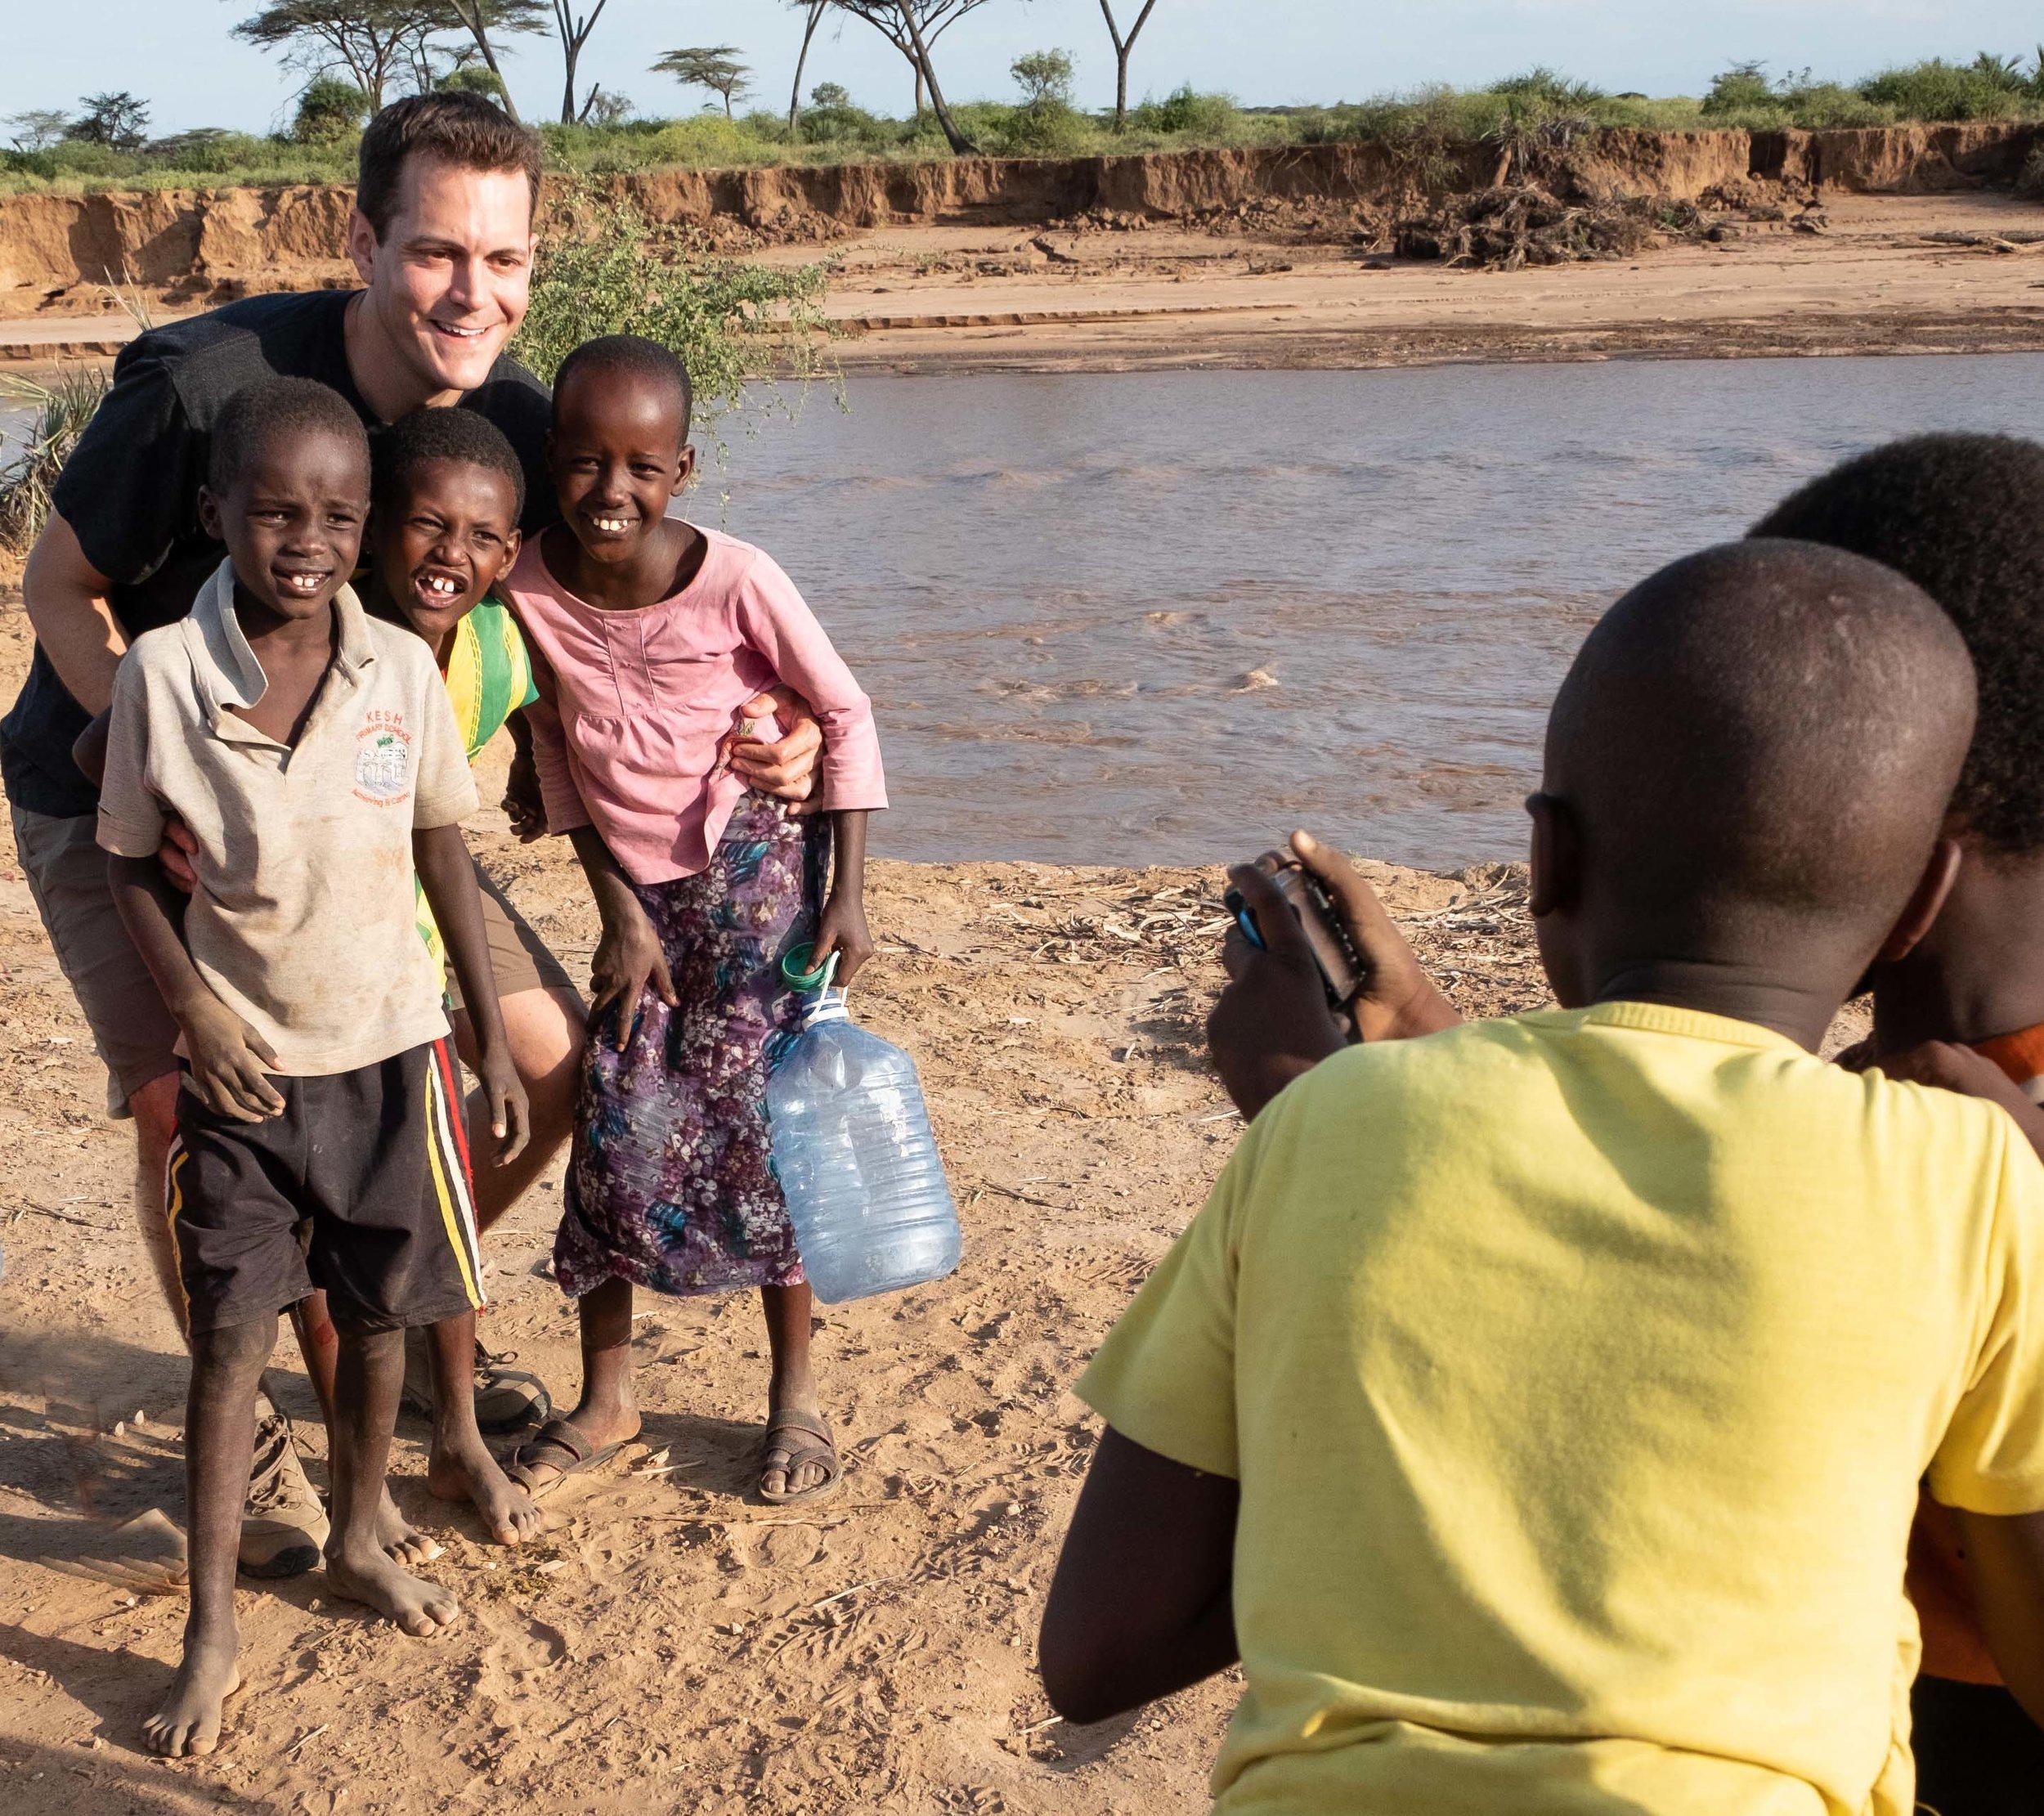 Doug Smith, The Samburu Project Board Member